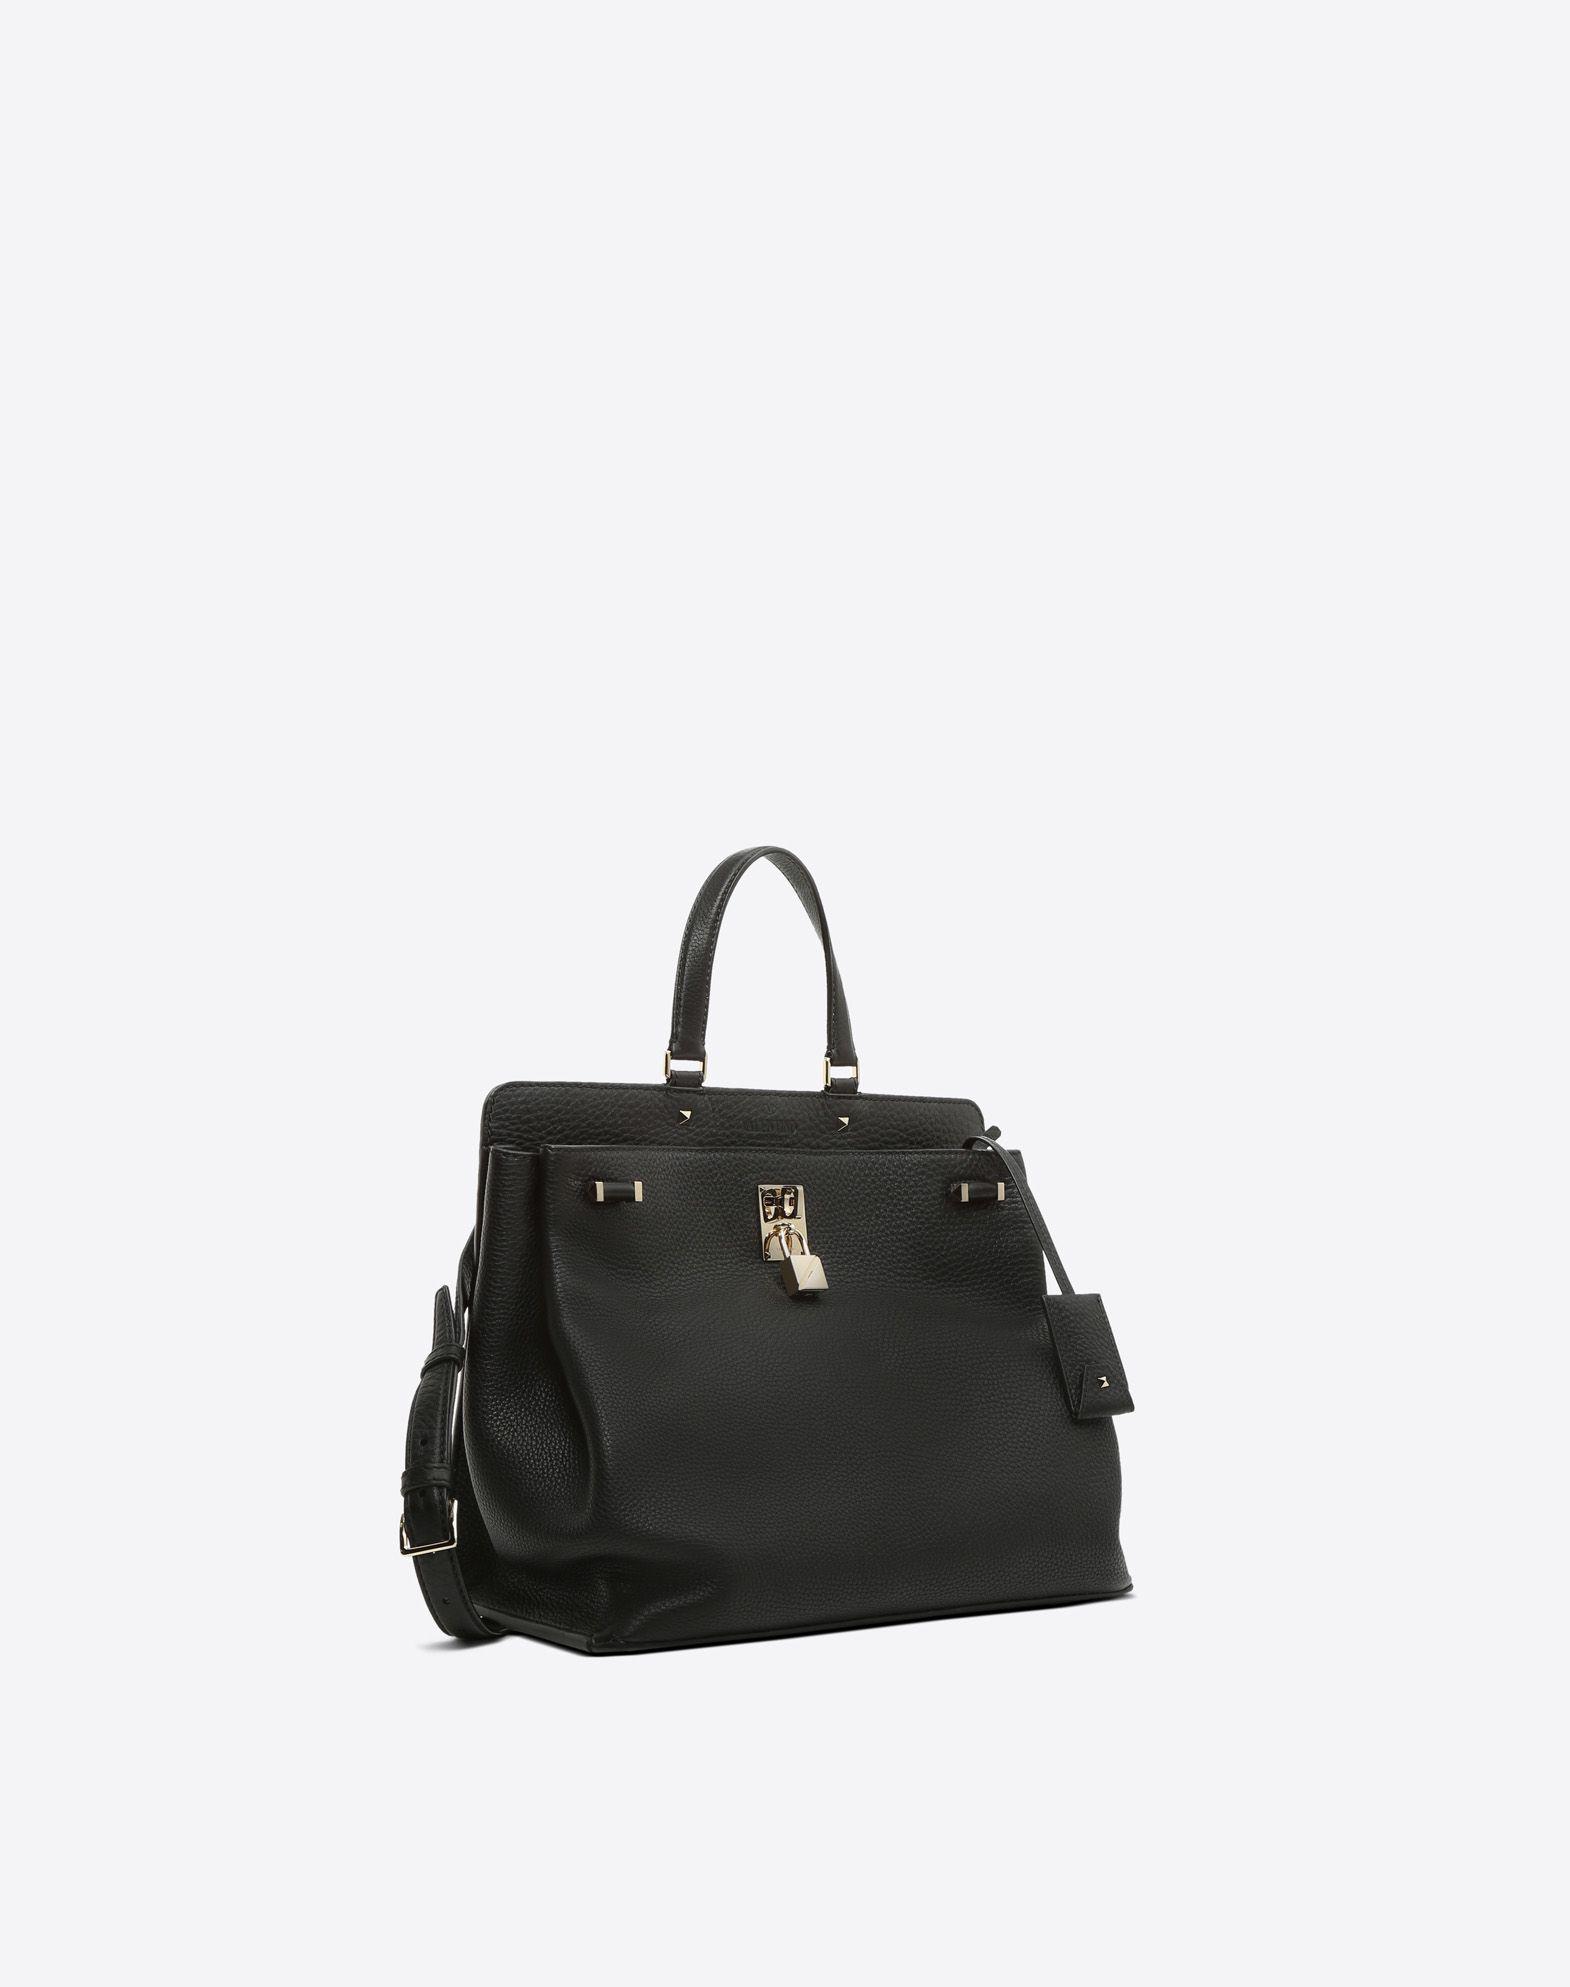 VALENTINO GARAVANI Joylock Handbag HANDBAG D r